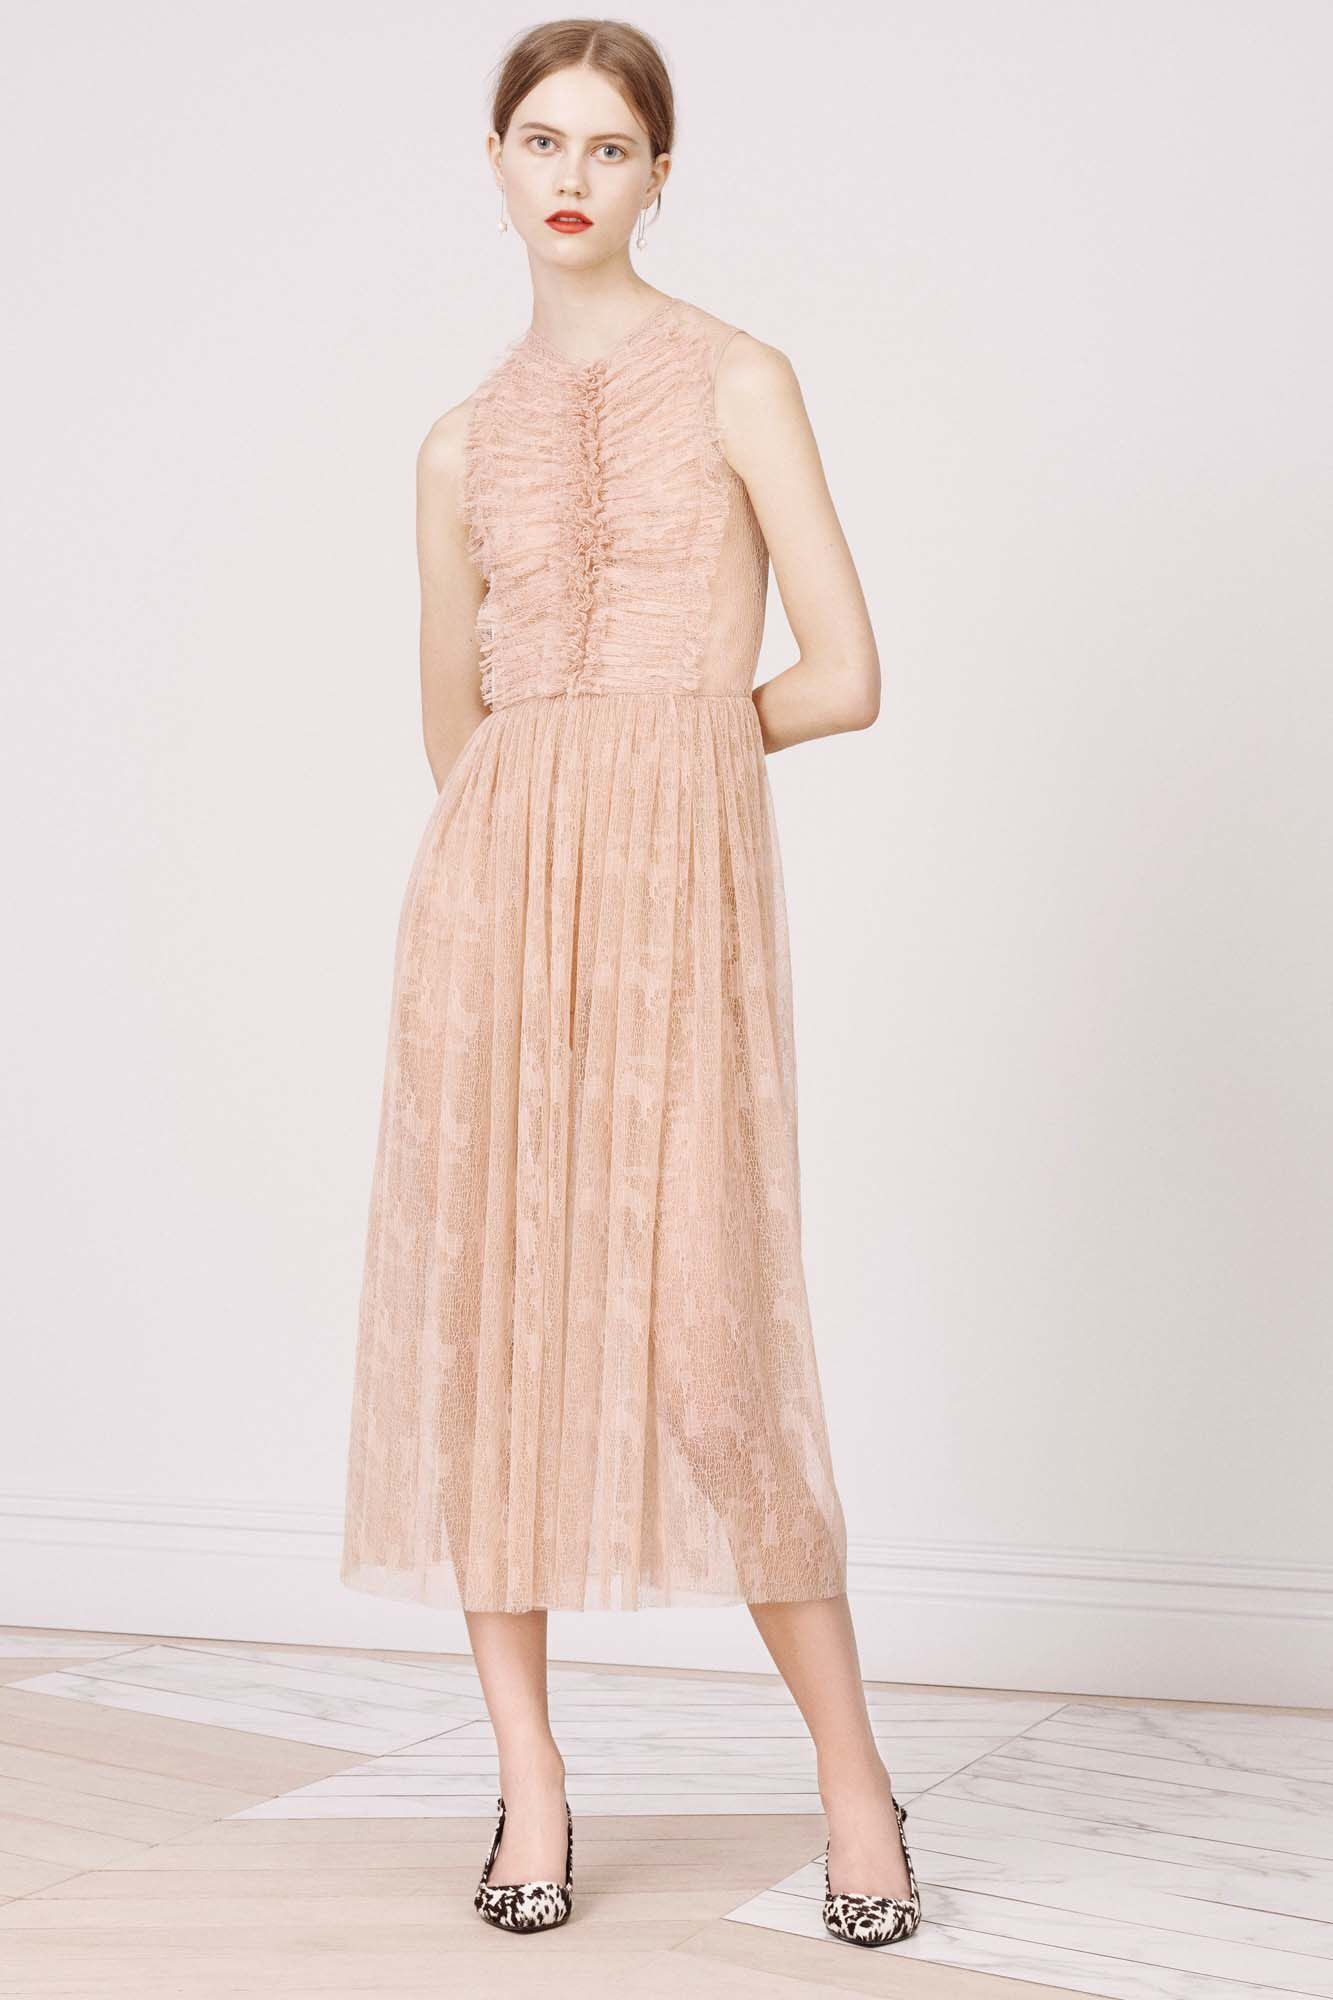 Cheap wedding guest dresses for fall 2018 a living